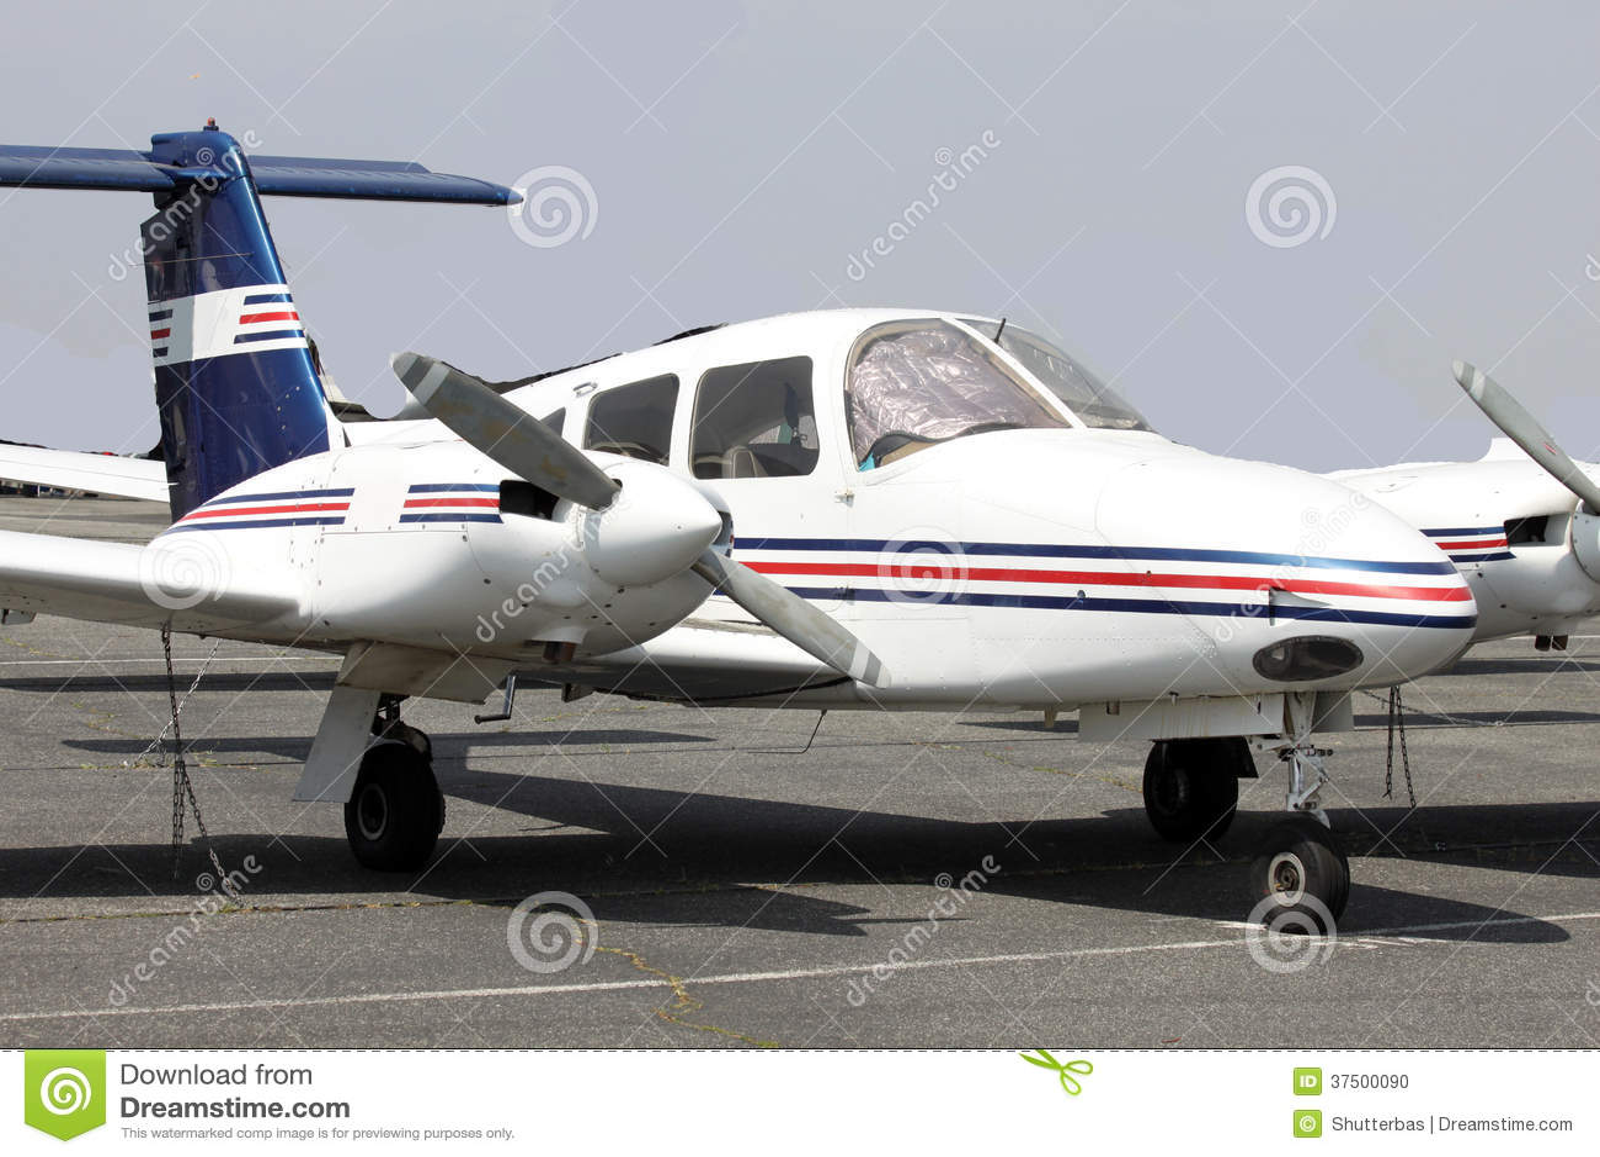 Small Plane In Big Mountains Stock Photo Cartoondealer